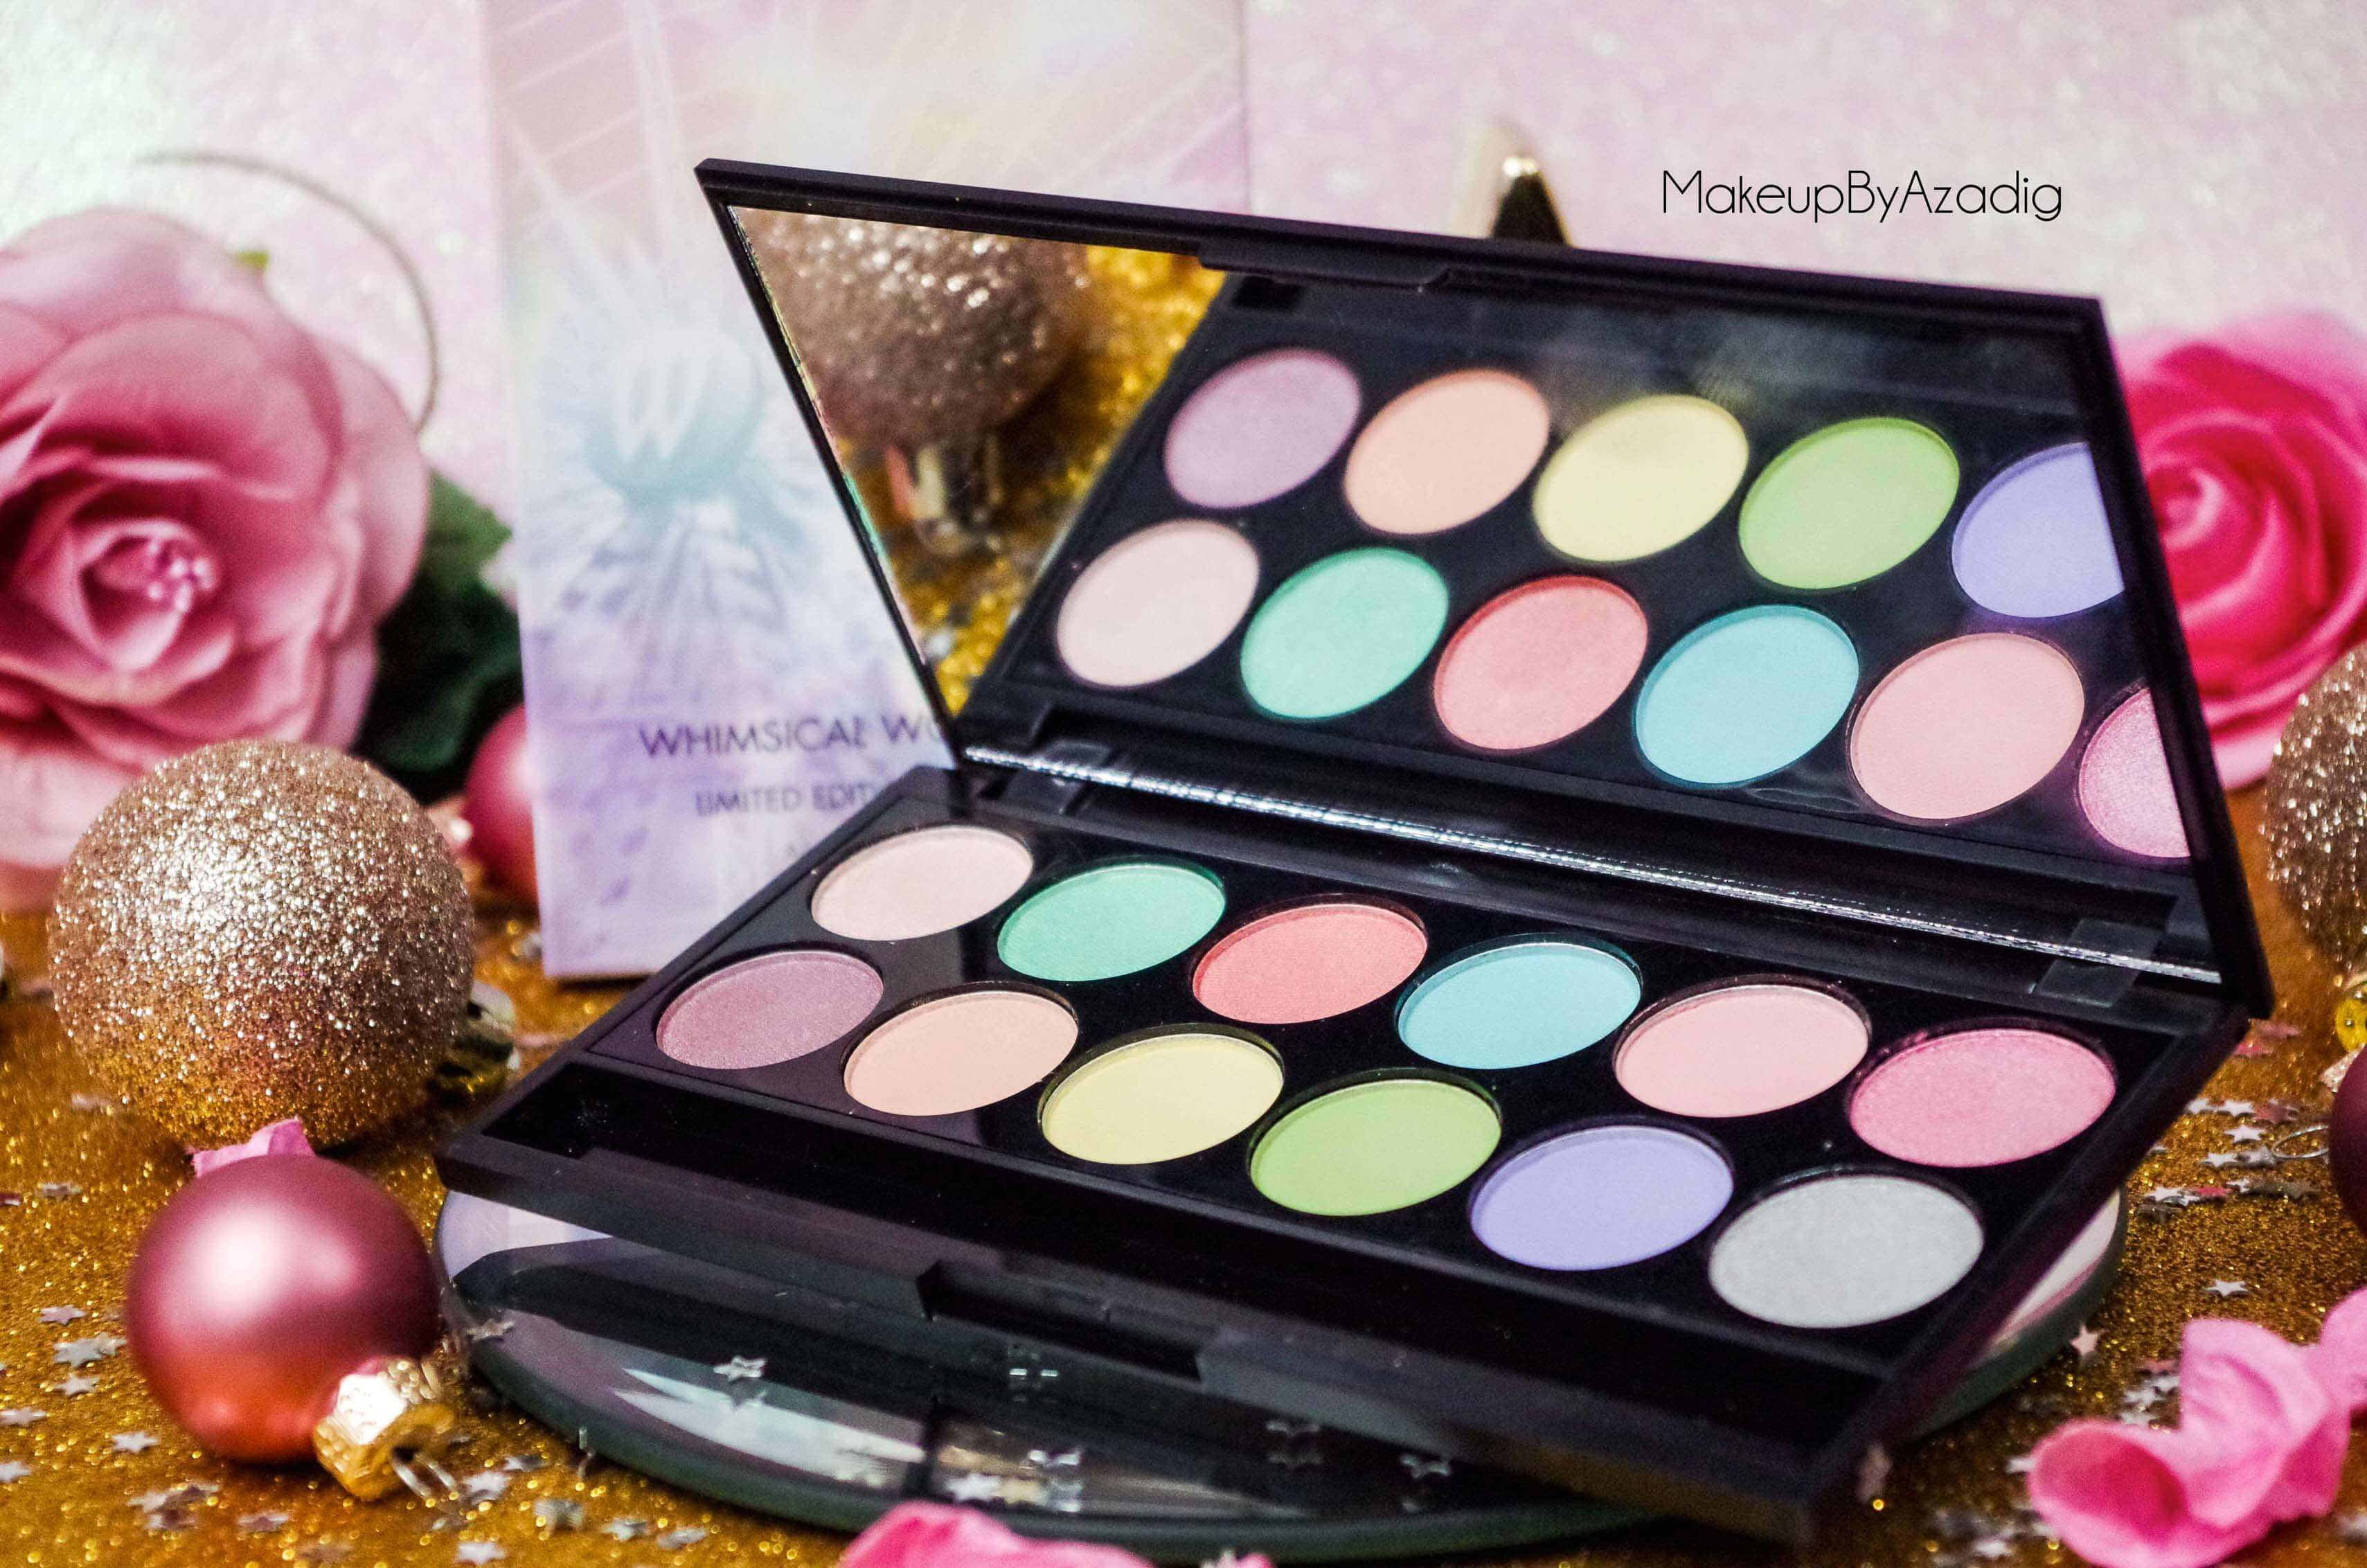 review-palette-sleek-makeup-idivine-pas-cher-sephora-couleurs-allthefunofthefair-code-promo-sephora-paris-makeupbyazadig-miniature-2